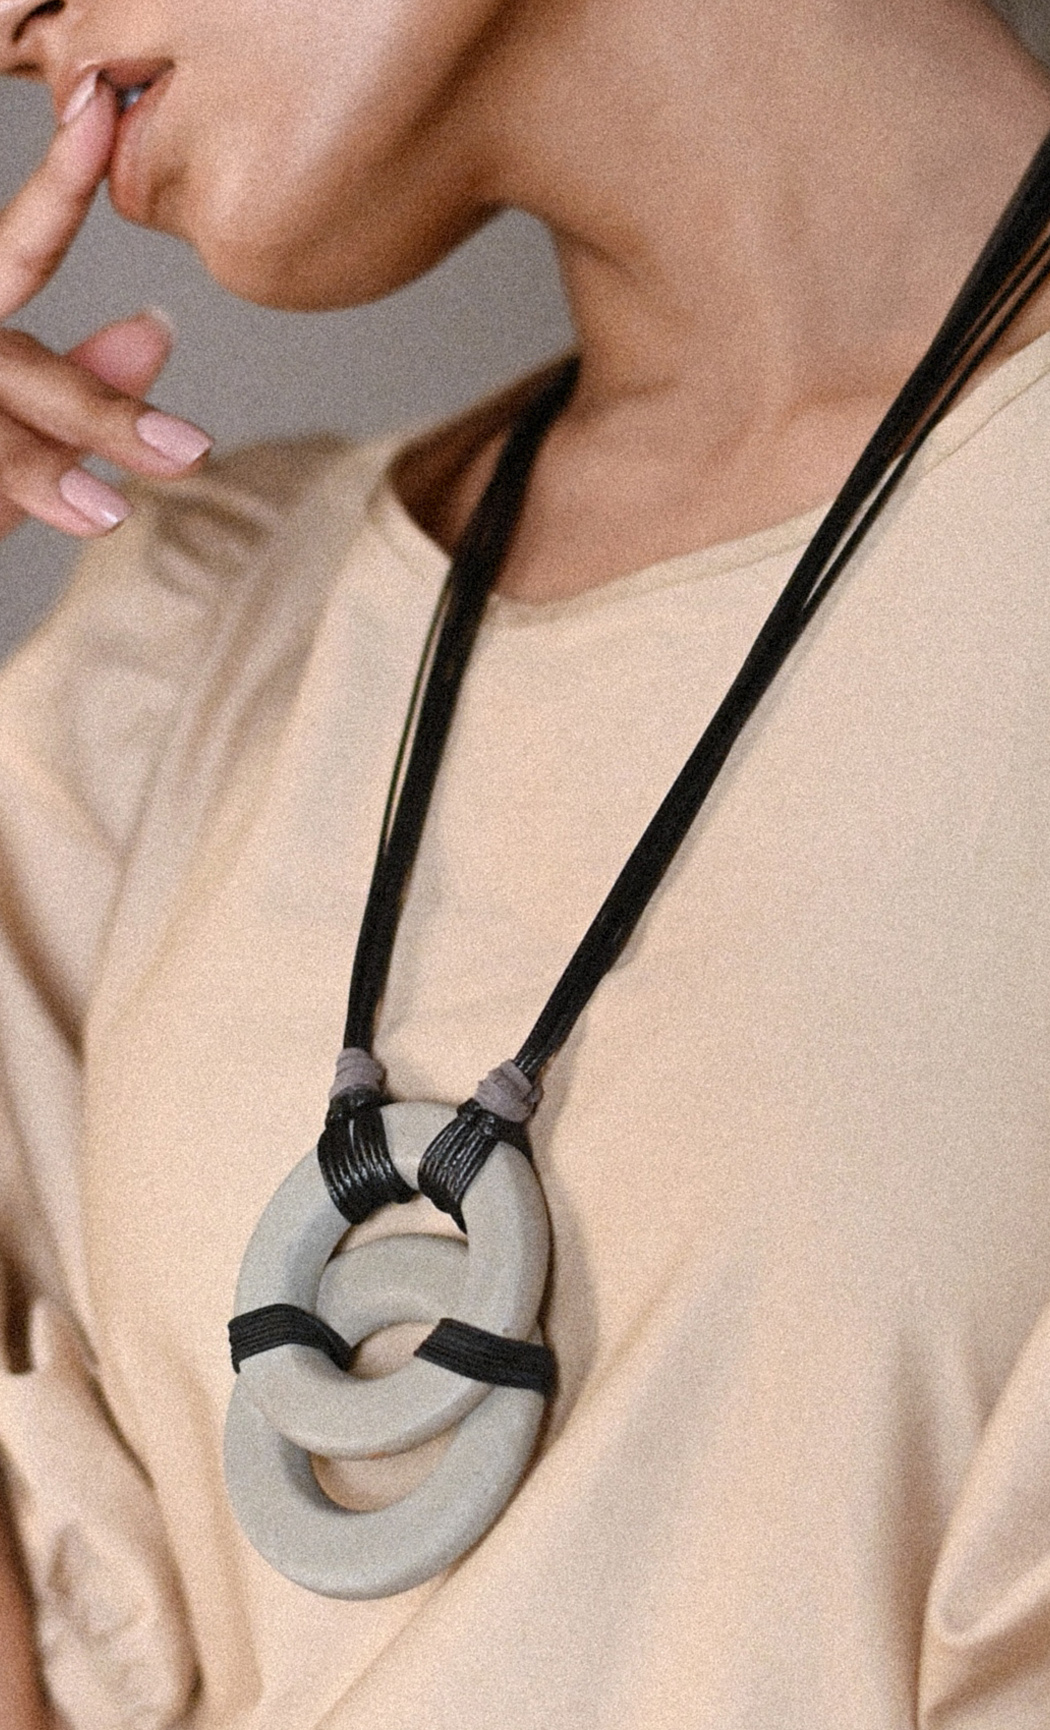 Black Vesica Long Statement Necklace - Buy Online